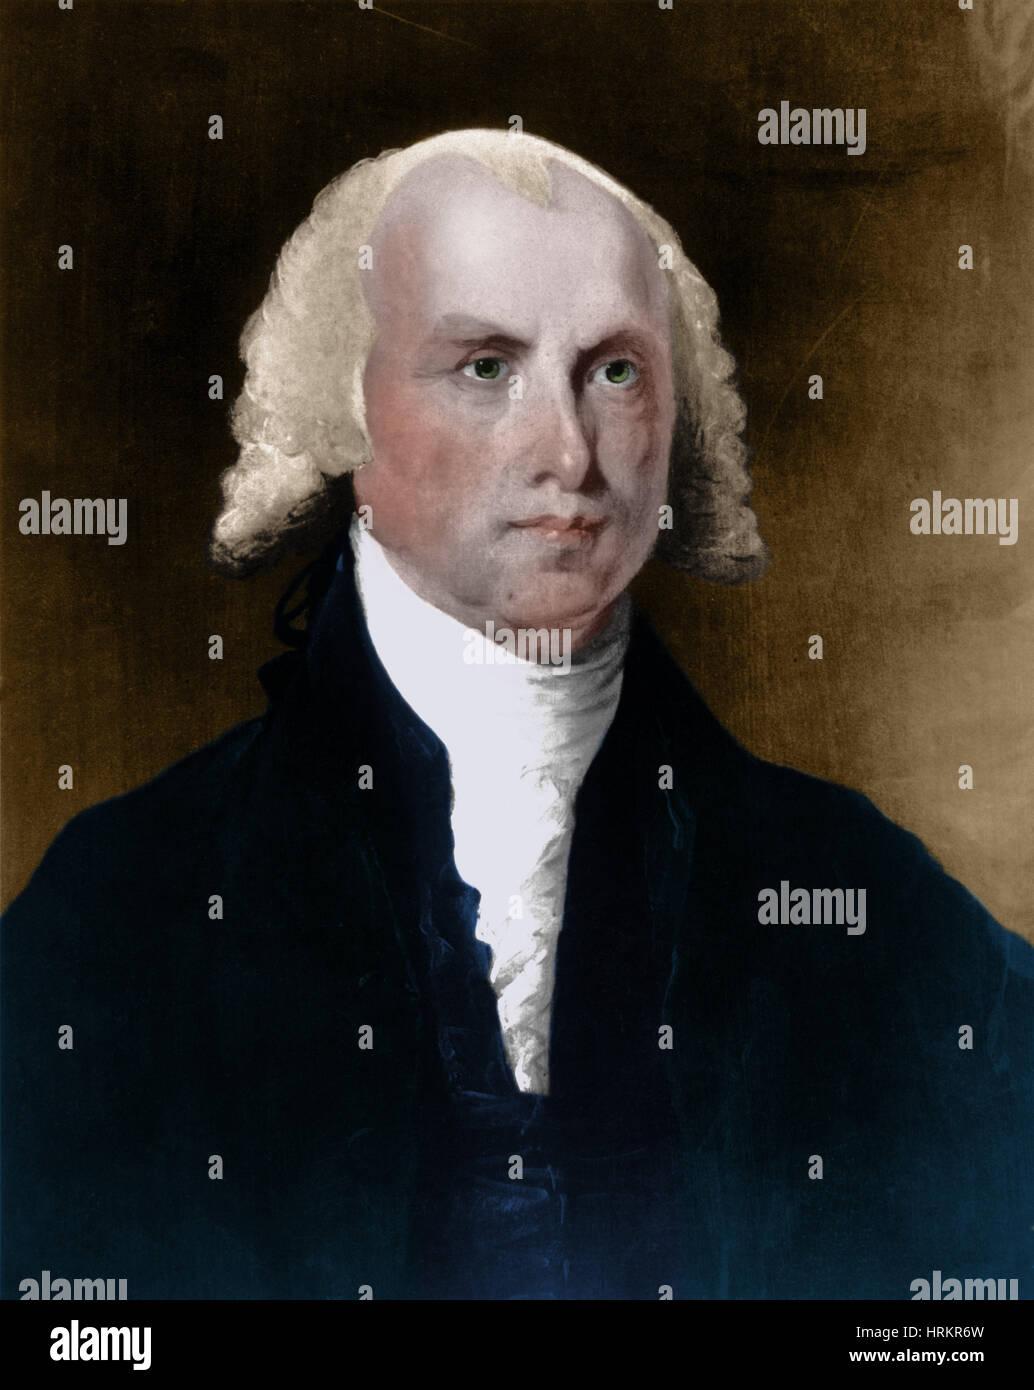 James Madison, 4th U.S. President - Stock Image